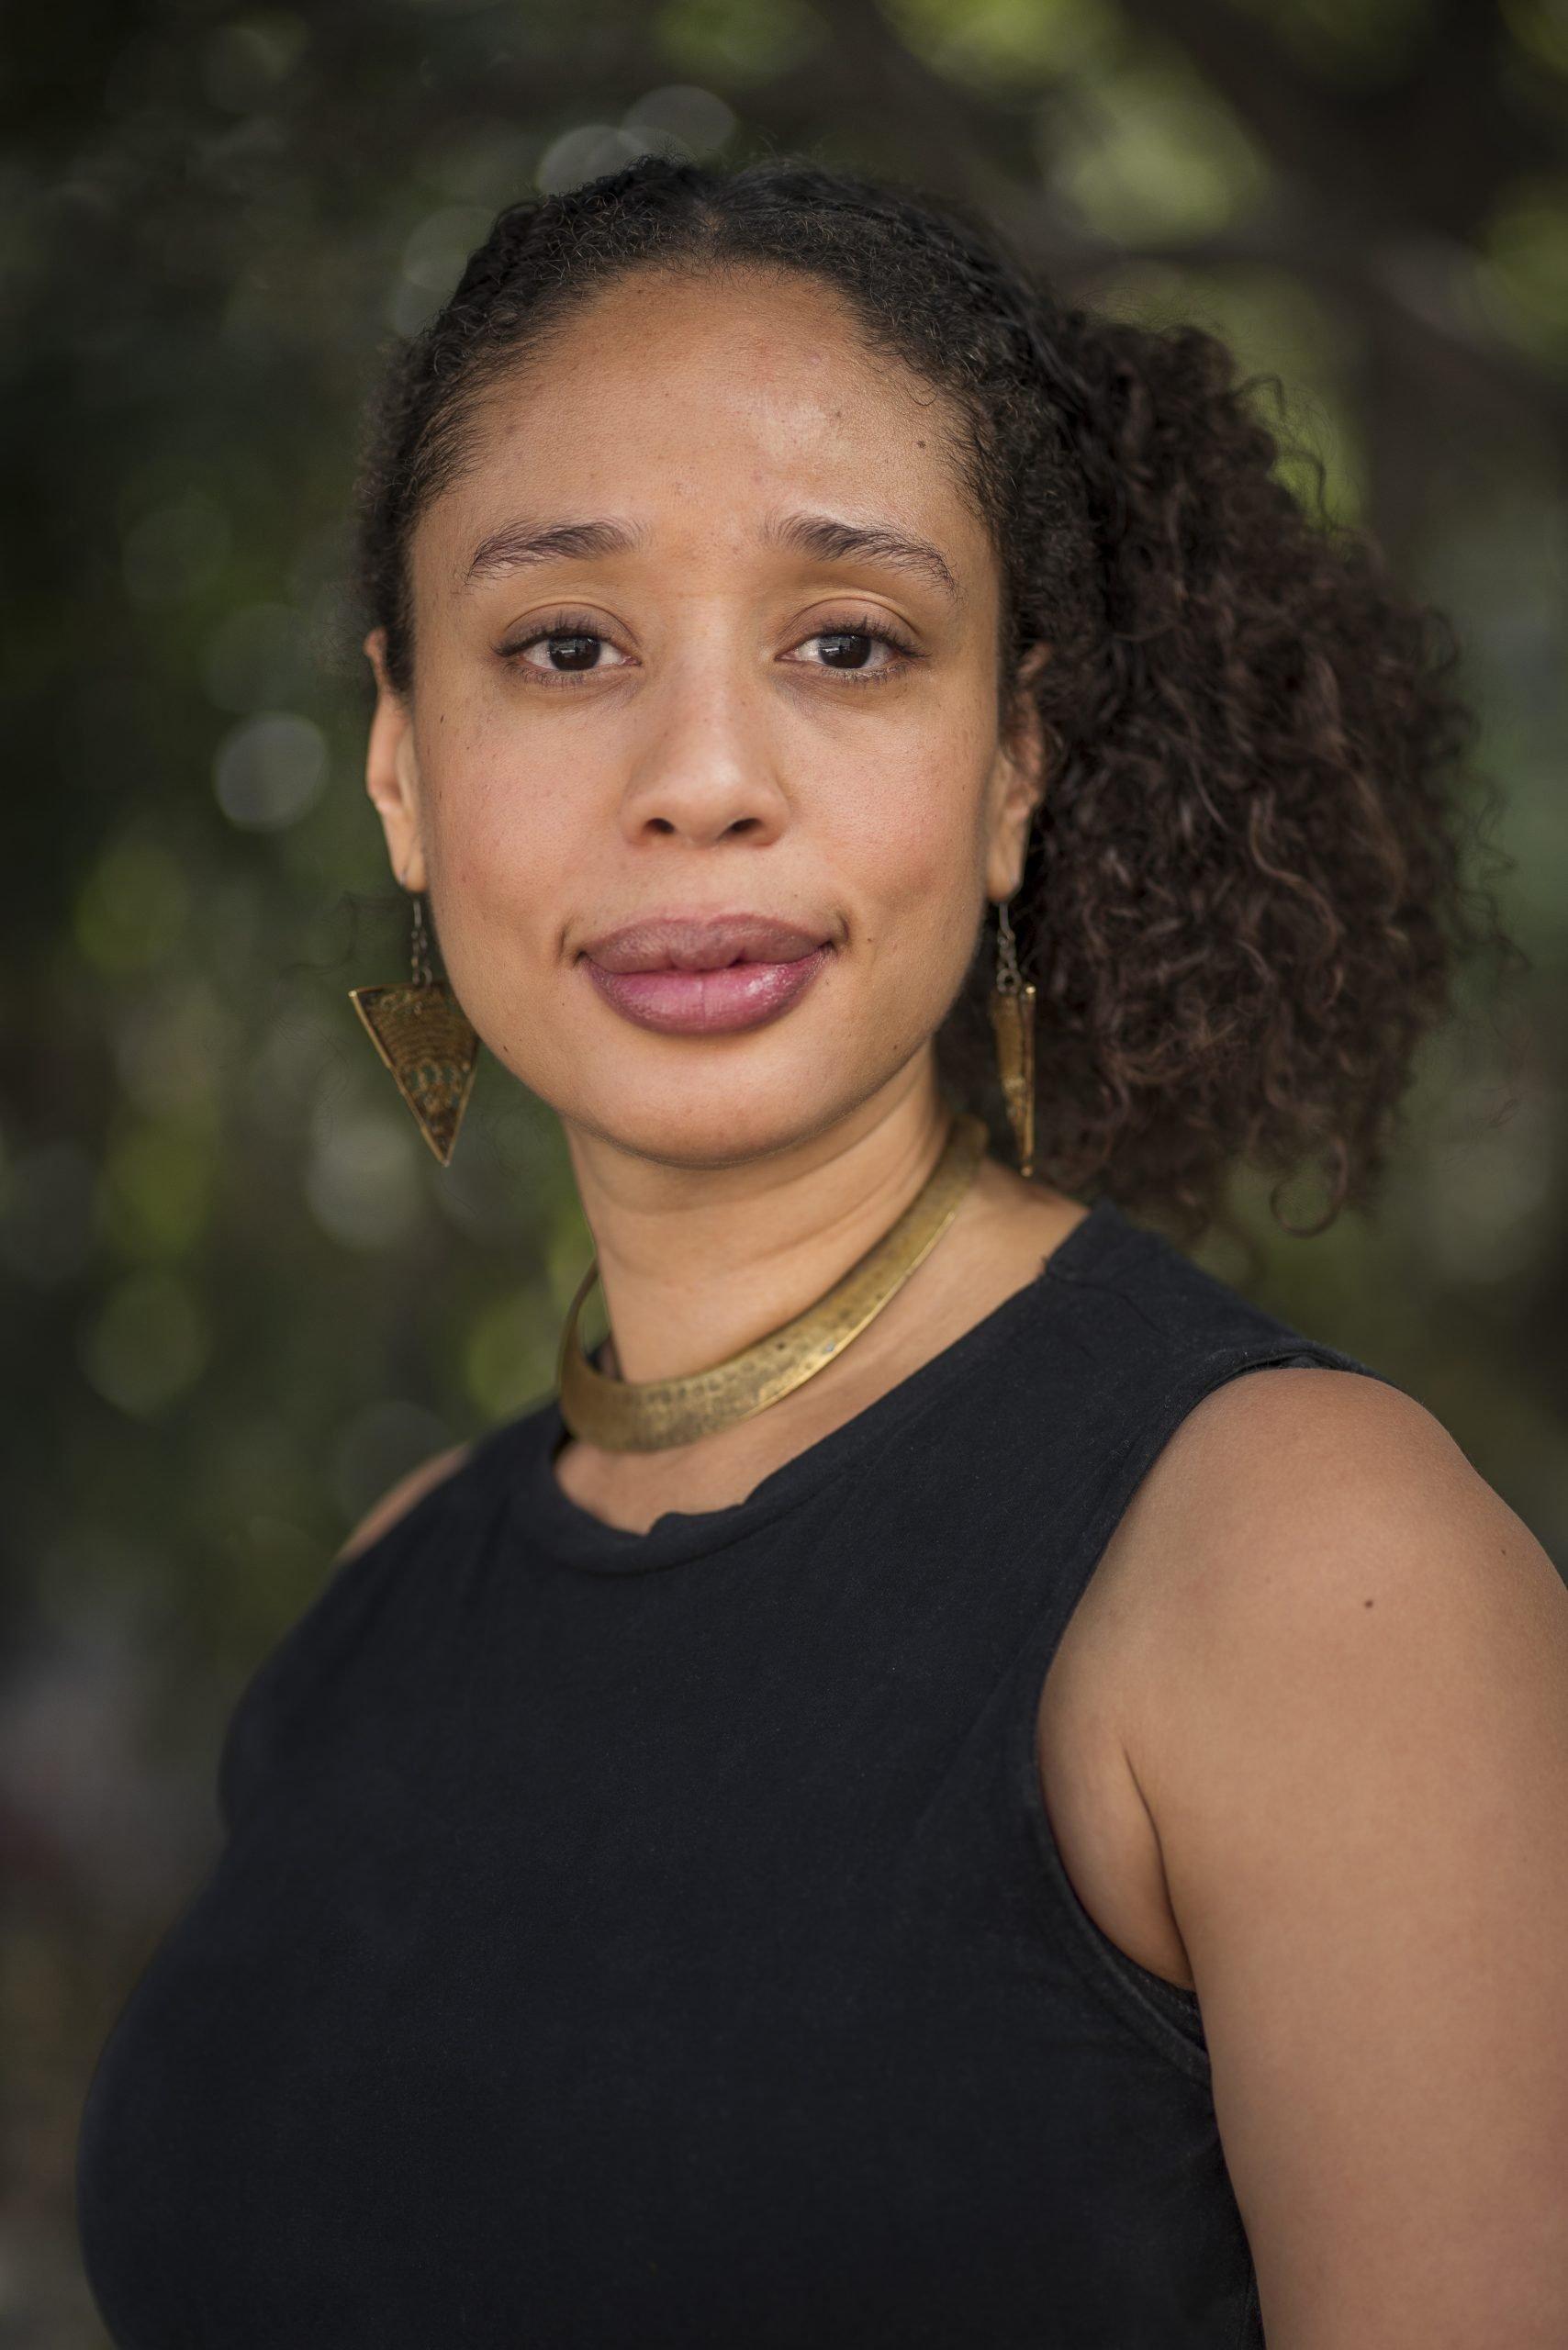 An image of the author Alaya Dawn Johnson